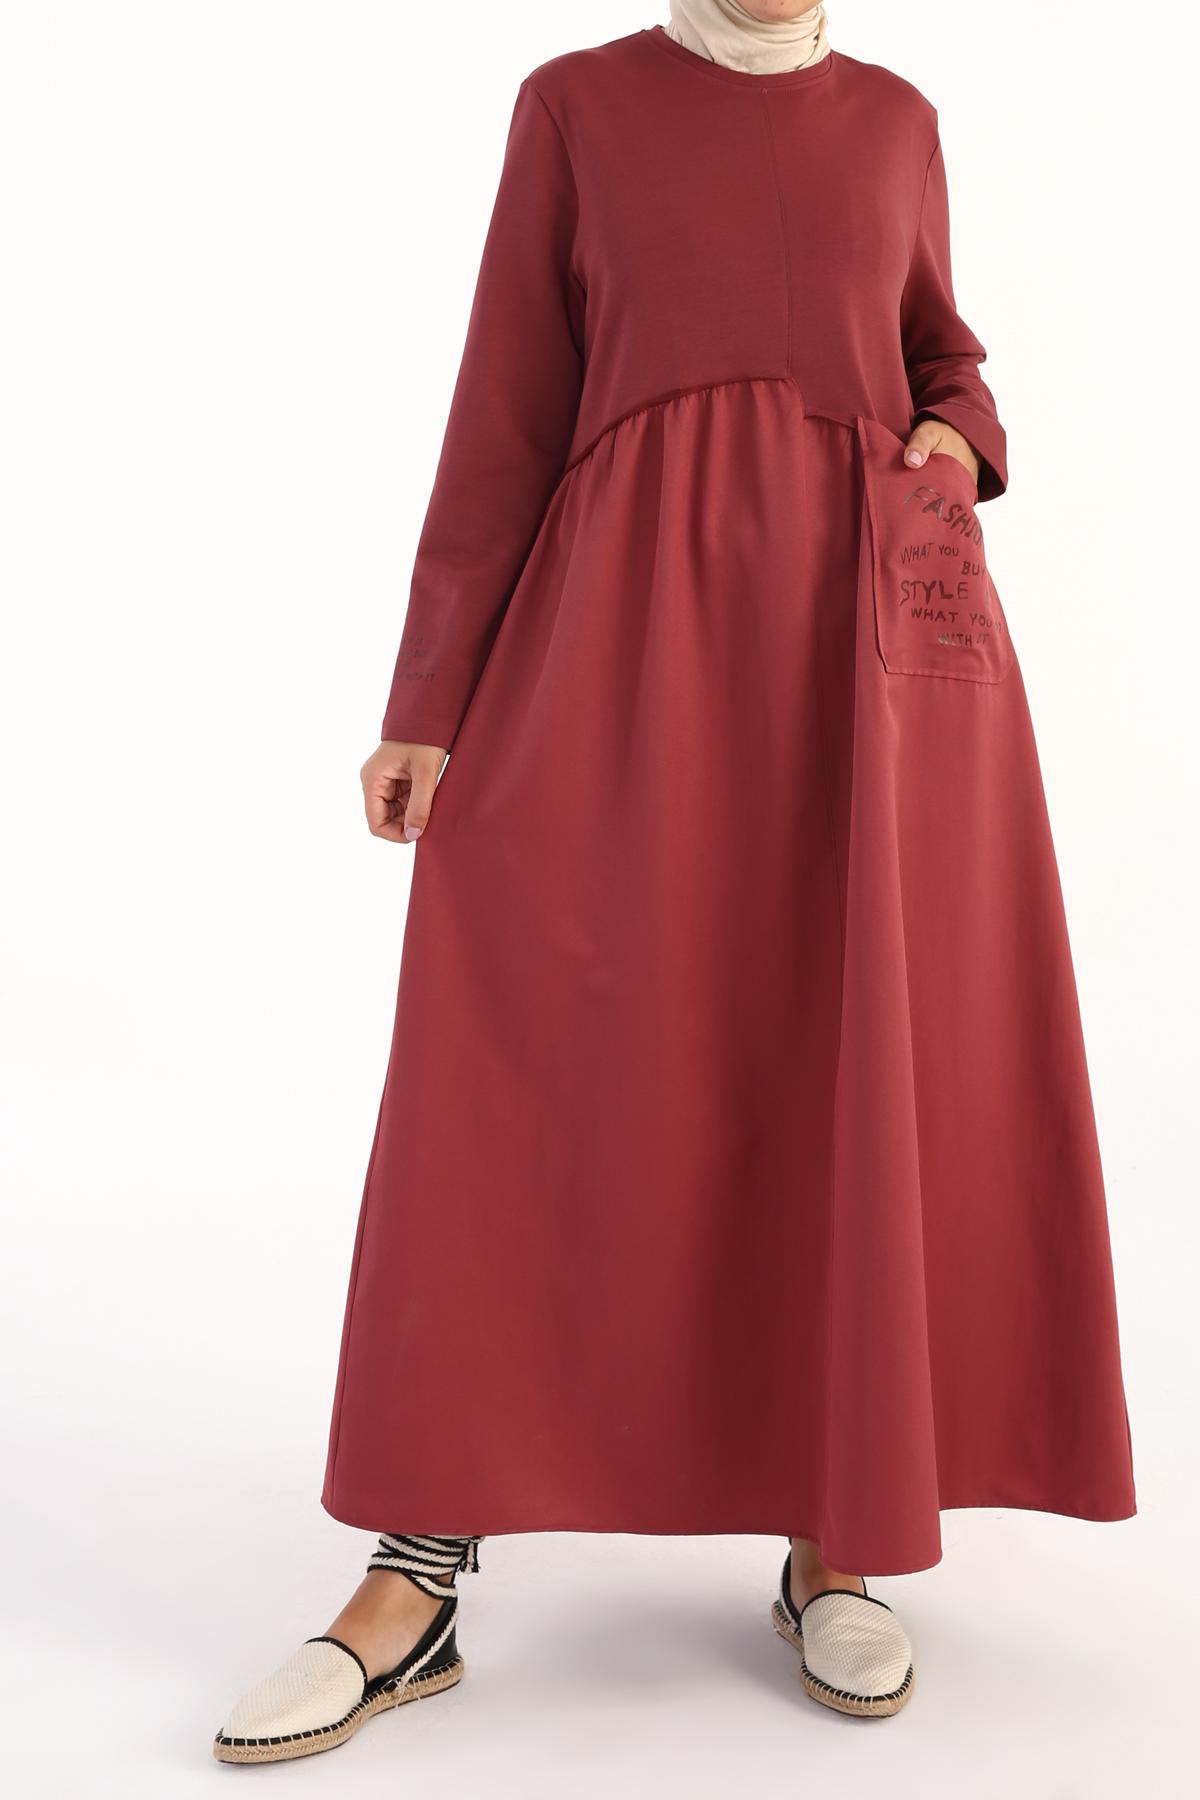 Pockets Printed Comfy Dress